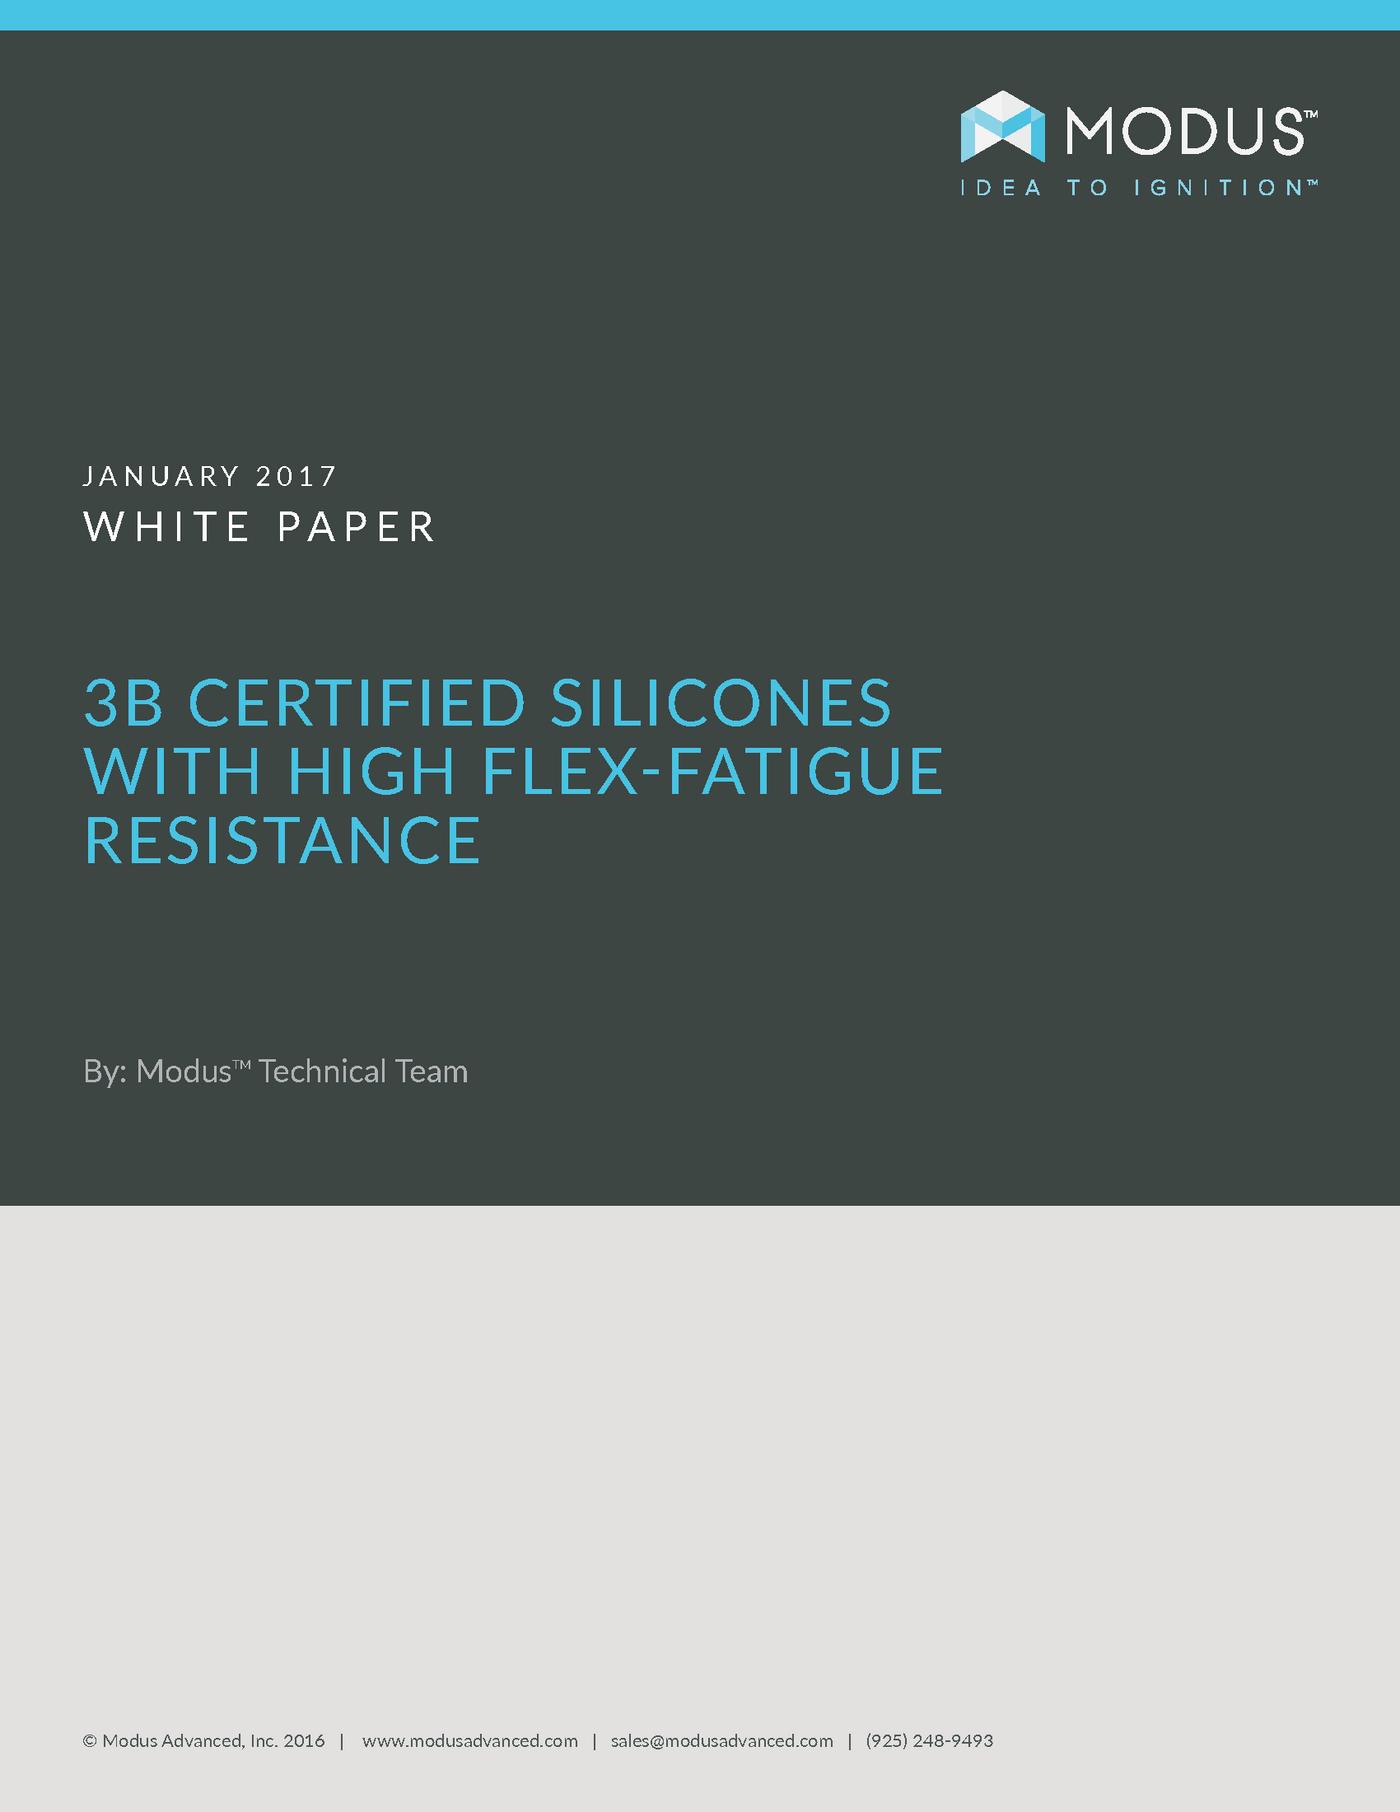 A-A-59588 Class 3B Silicones White Paper